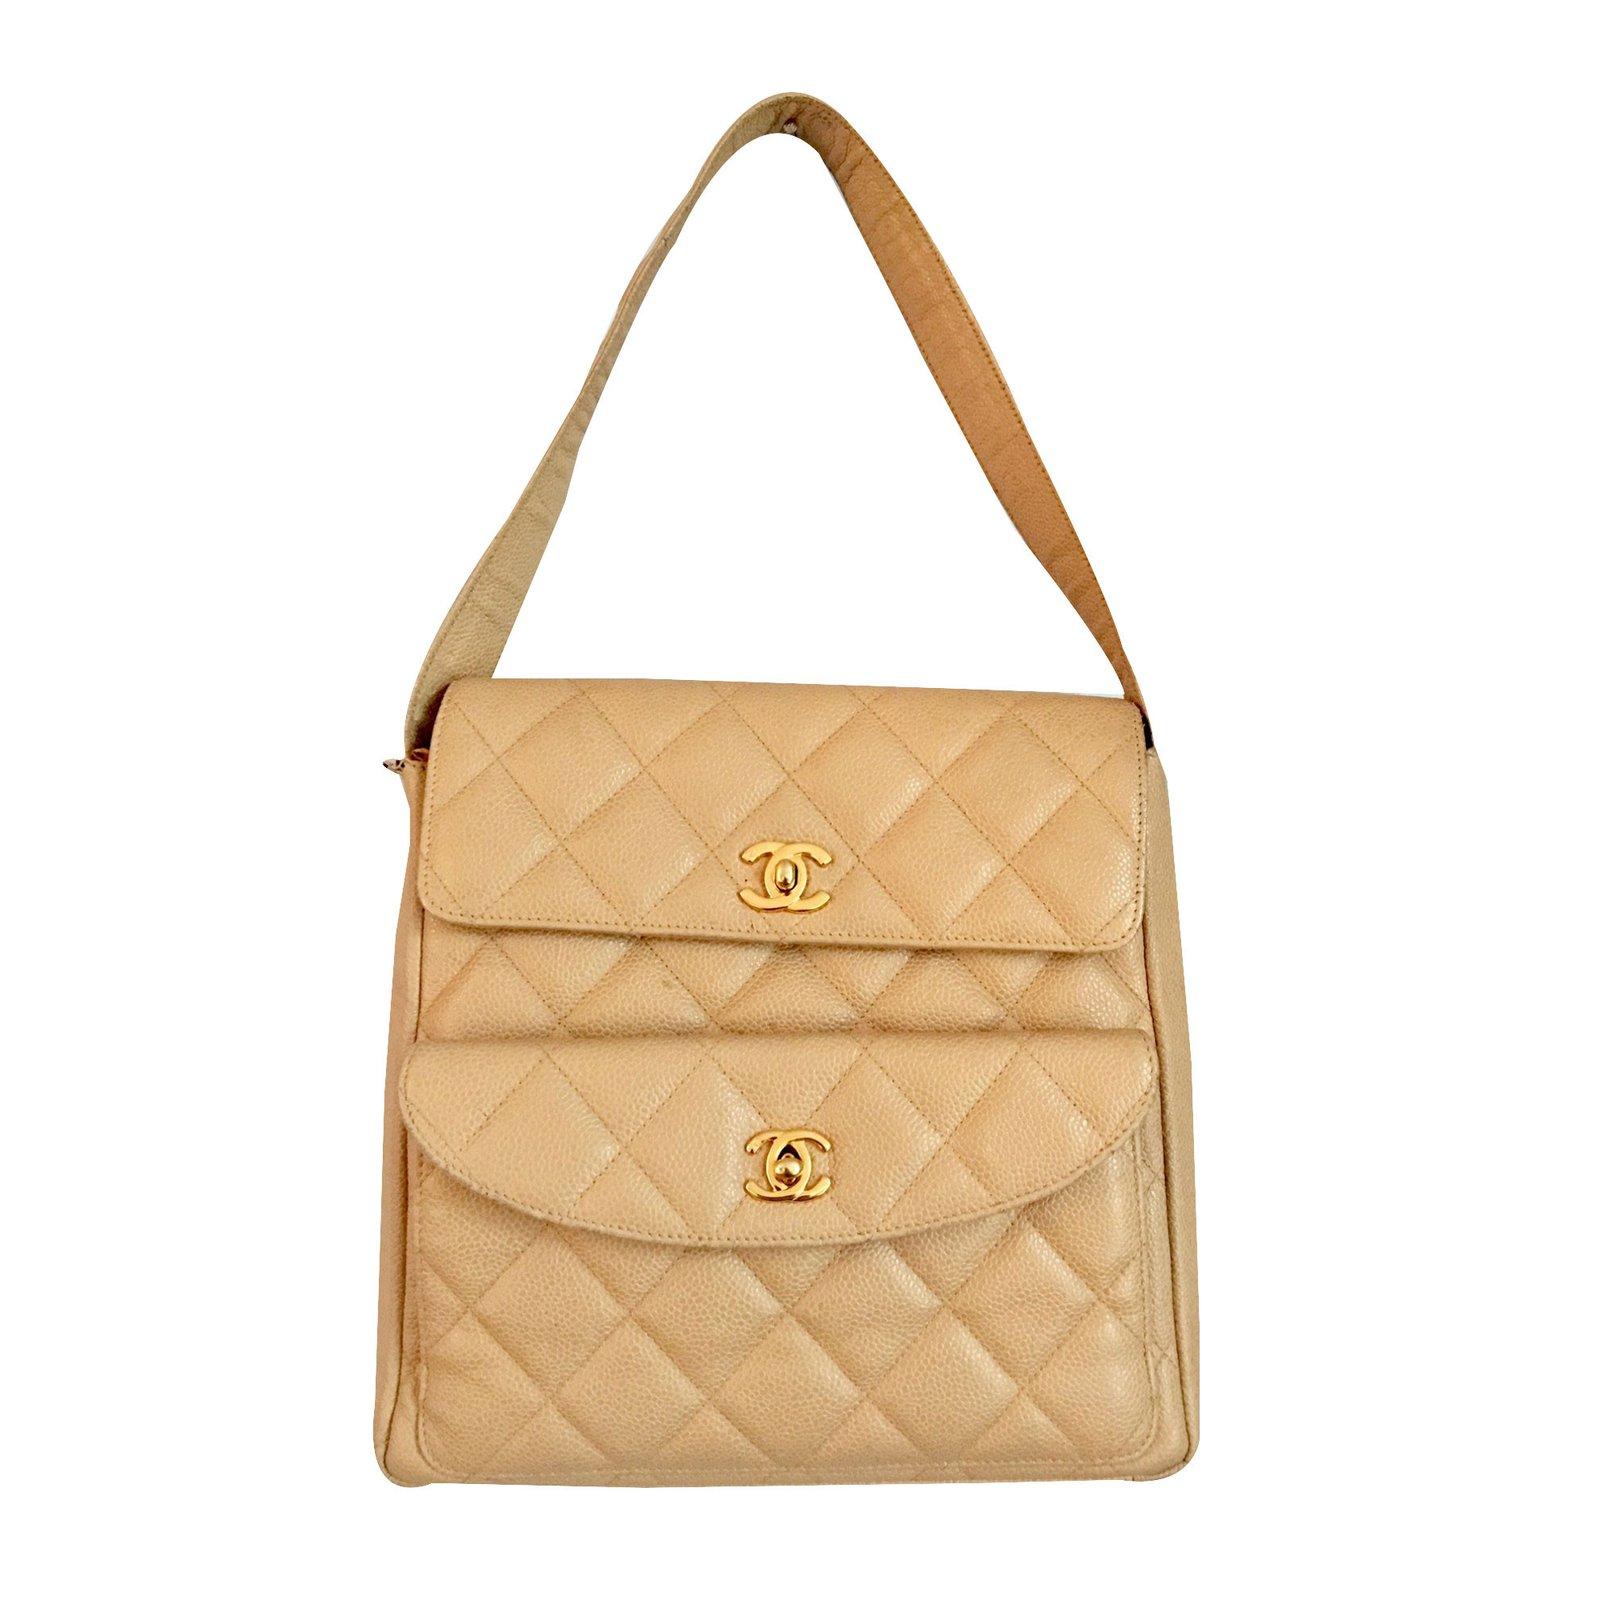 Sacs A Main Chanel Sac Matelasse Cuir Beige Ref 25365 Joli Closet